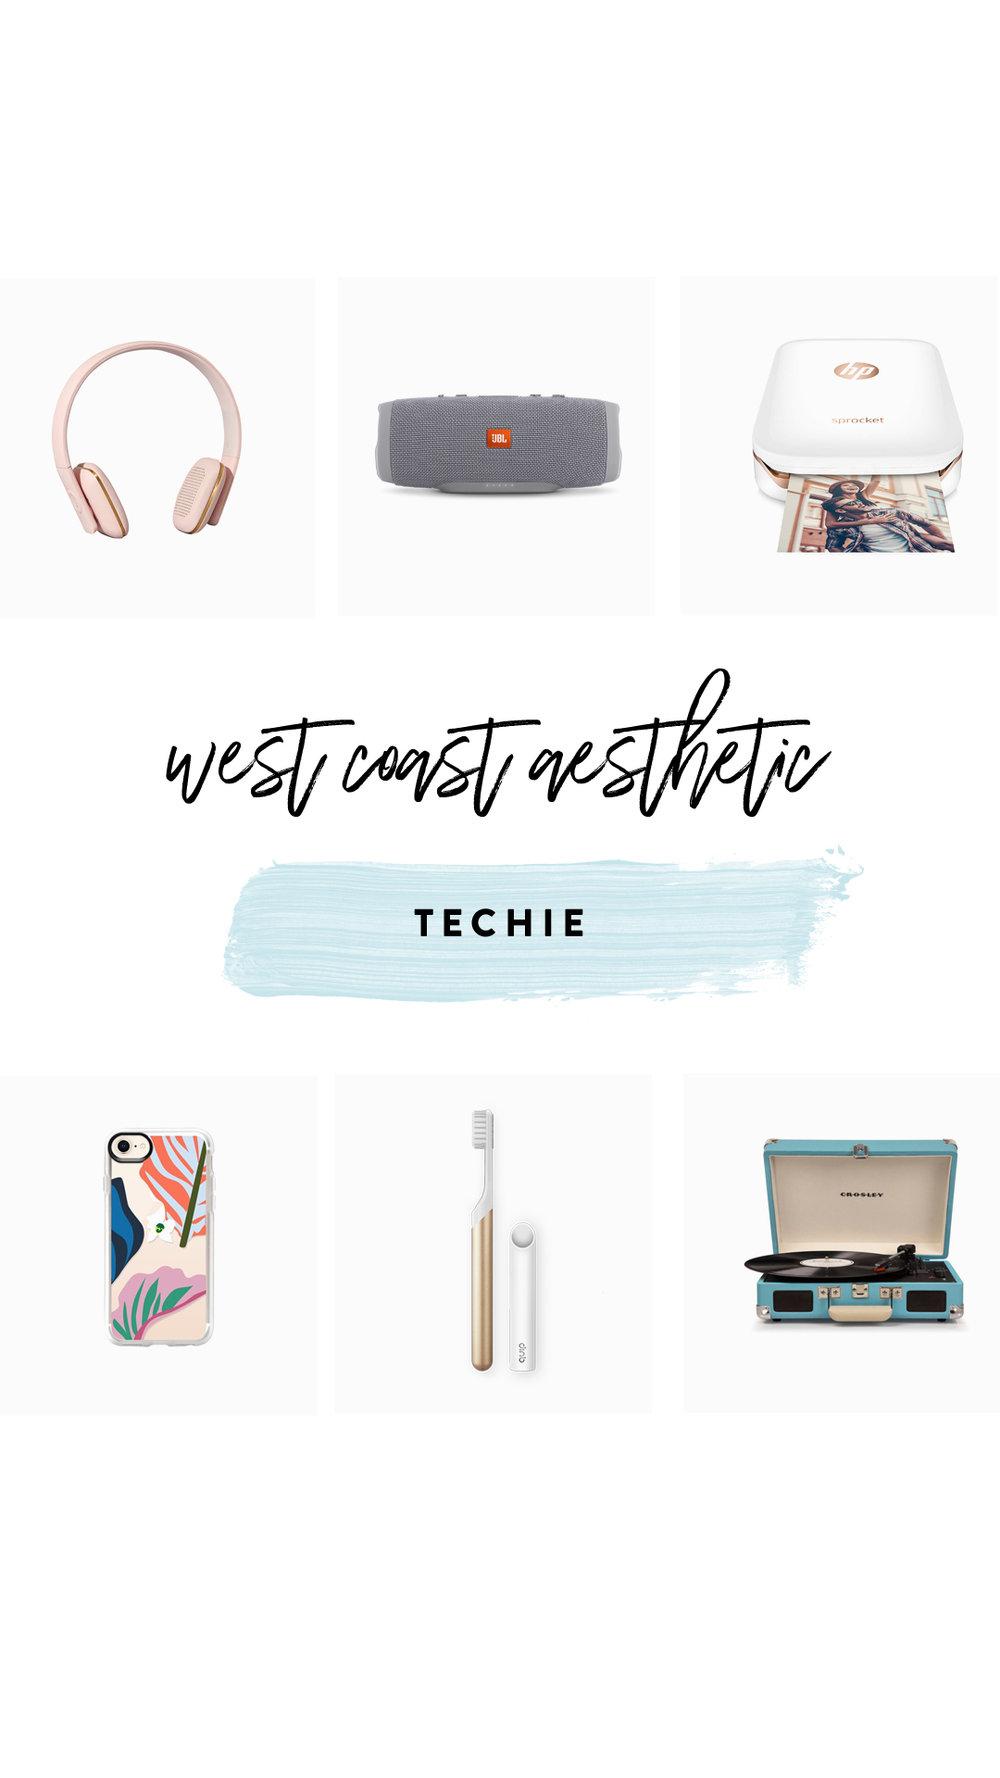 1.   Bluetooth Headphones   | 2.   Waterproof speaker     | 3.   Photo printer   | 4.   Phone case   | 5.   Electric toothbrush     | 6.   Record player